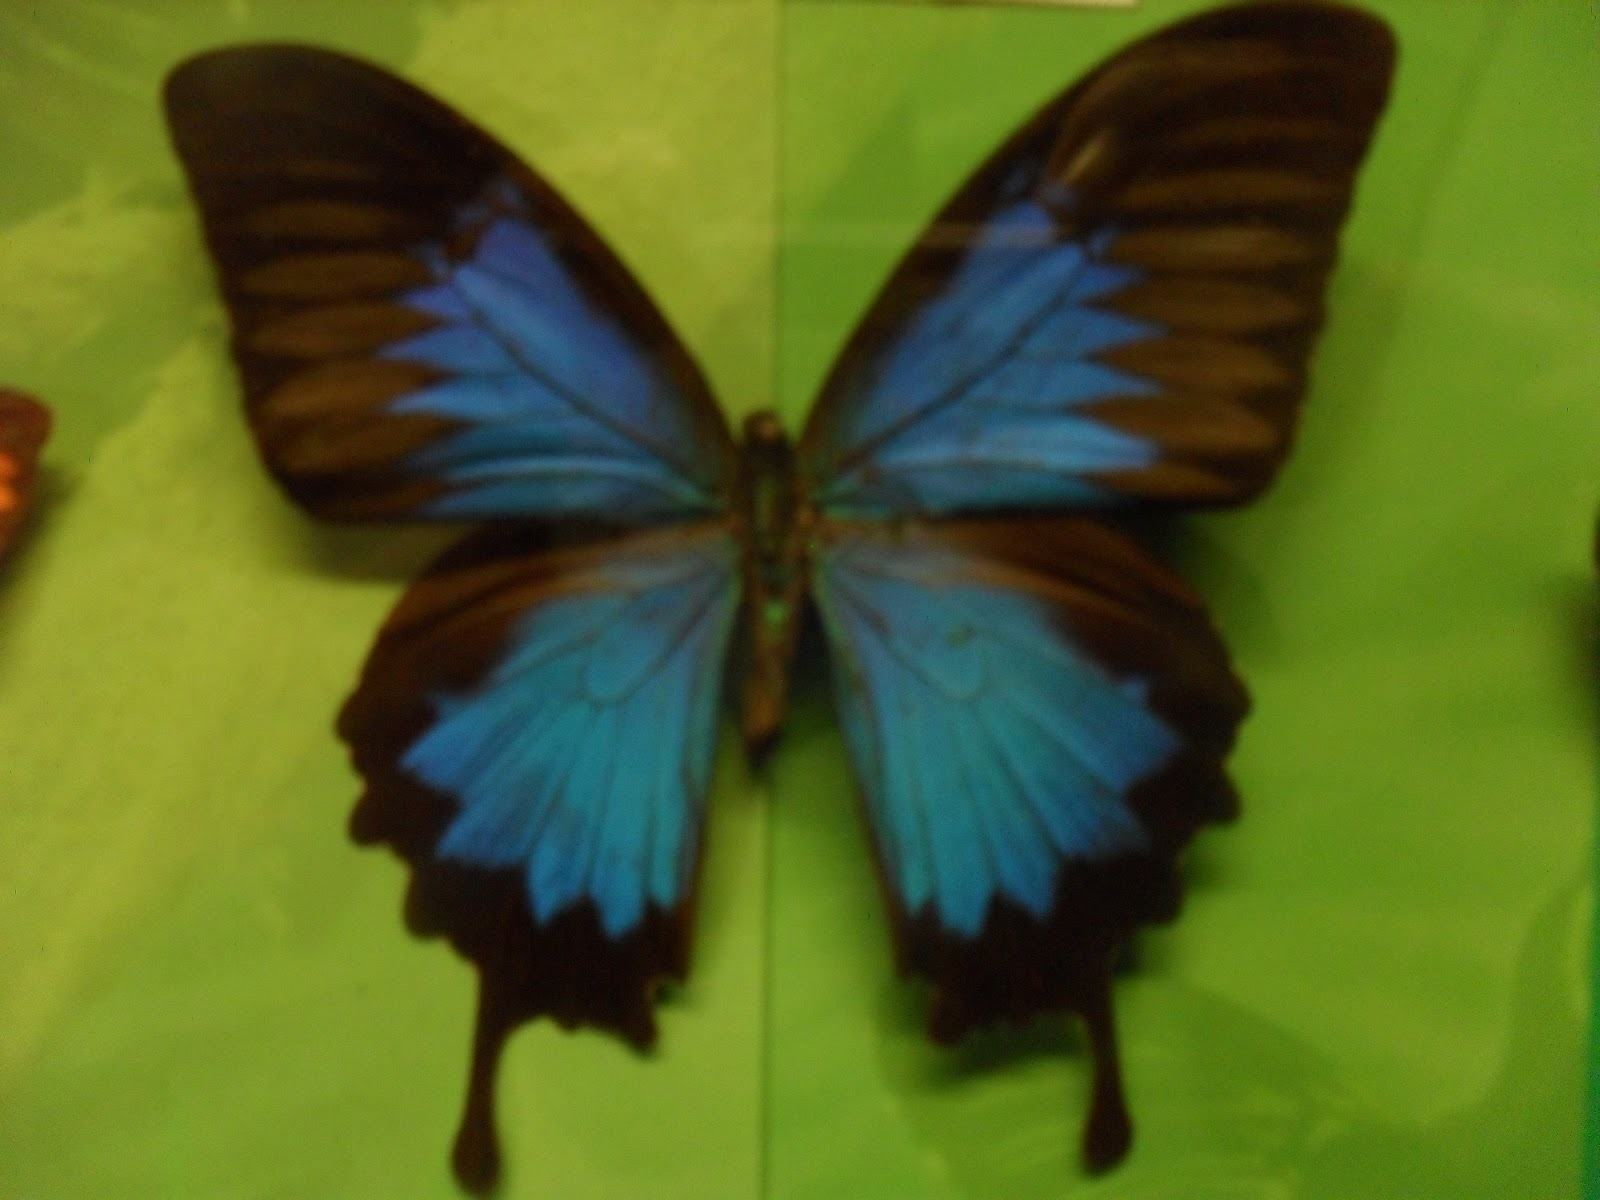 PRASEKOLAH SERI BEROLEH TEMA serangga